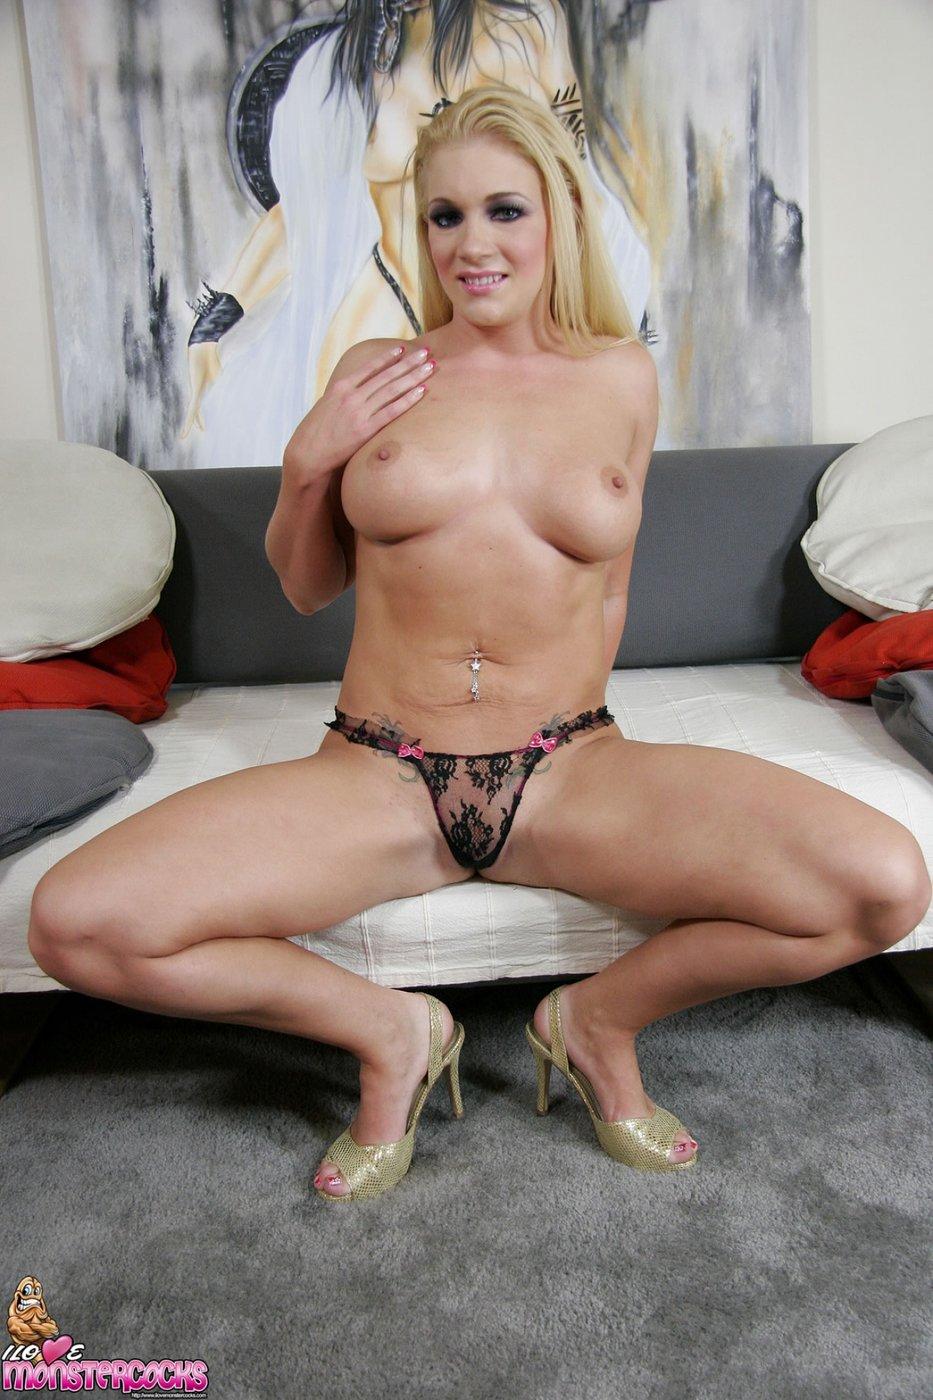 Self military shots female nude